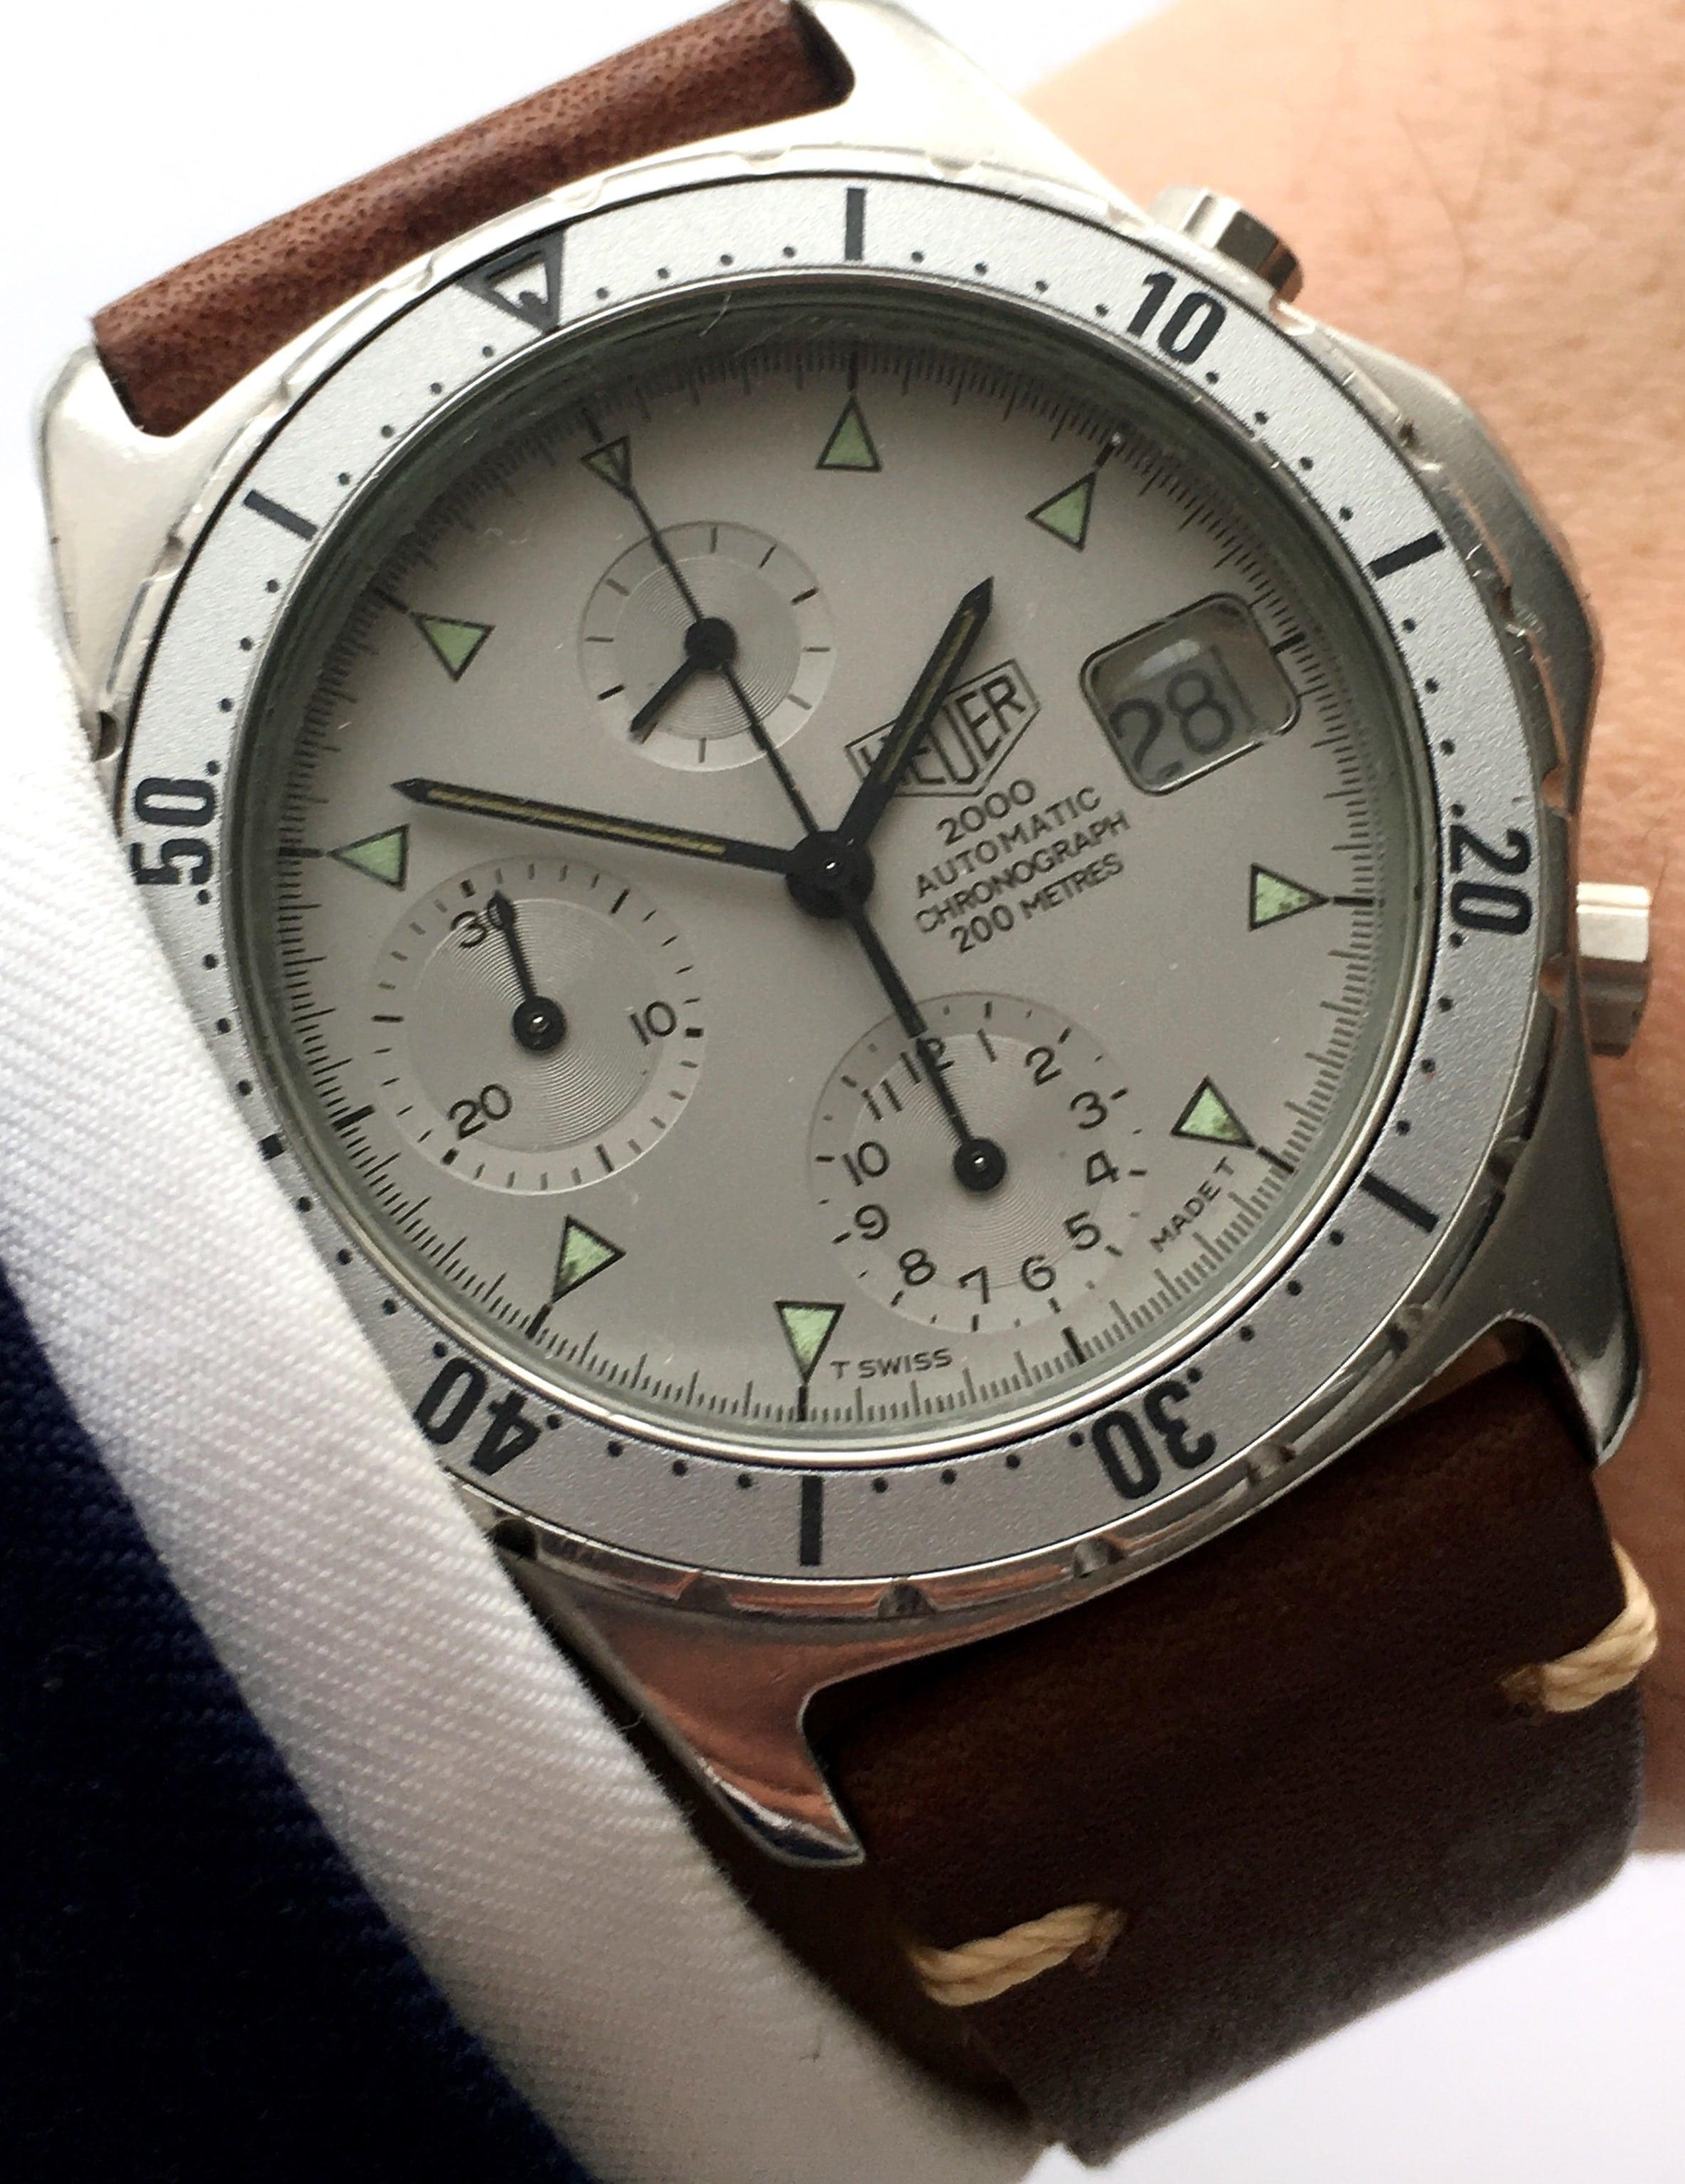 Vintage Heuer 2000 Automatic Chronograph Diver Watch ...